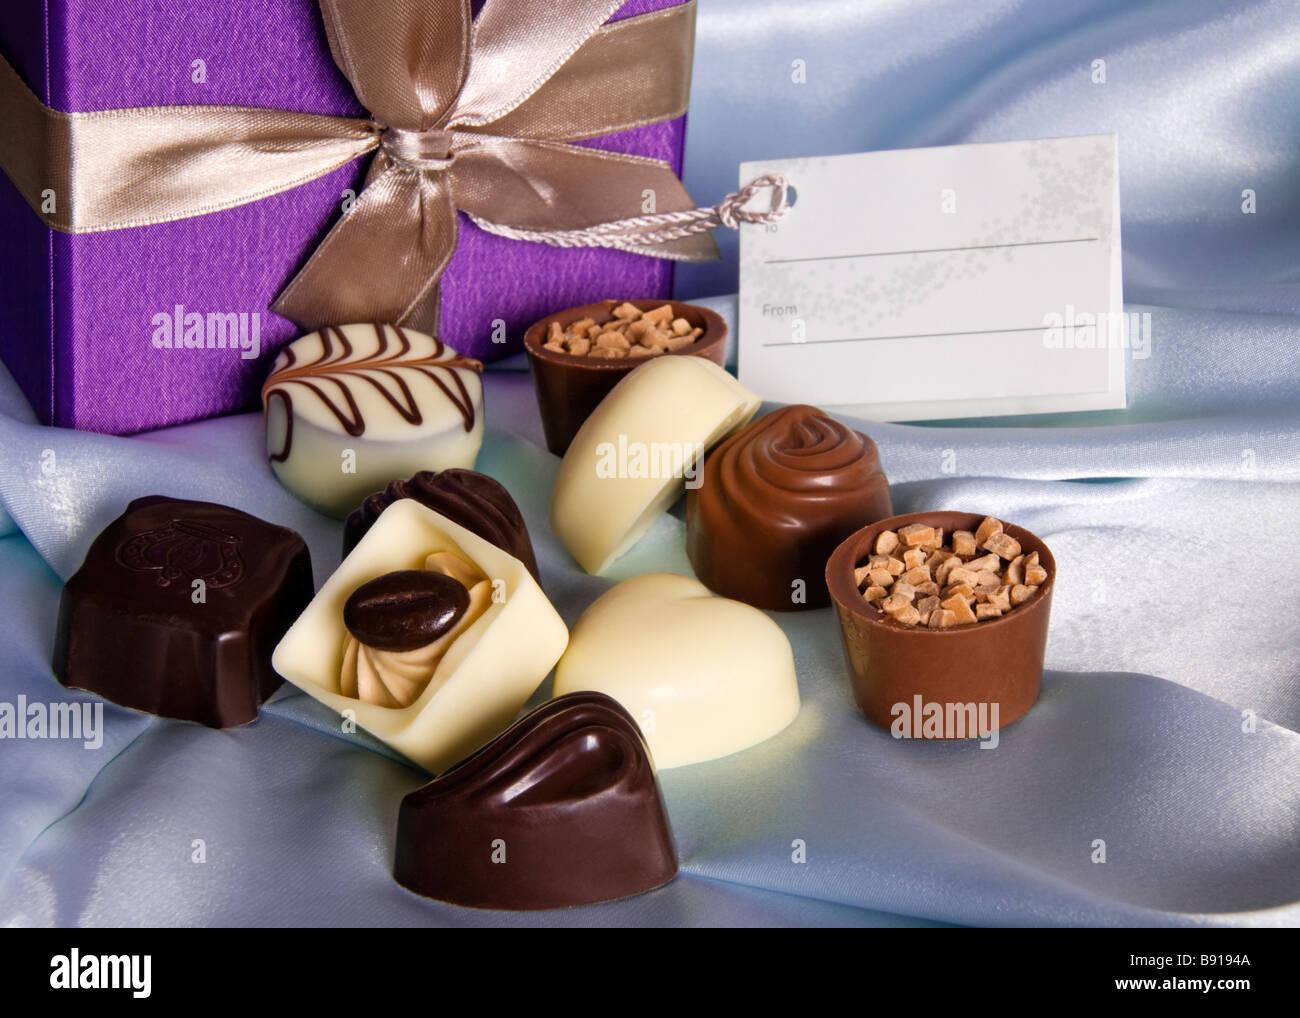 Gift box of assorted Belgian chocolates. - Stock Image